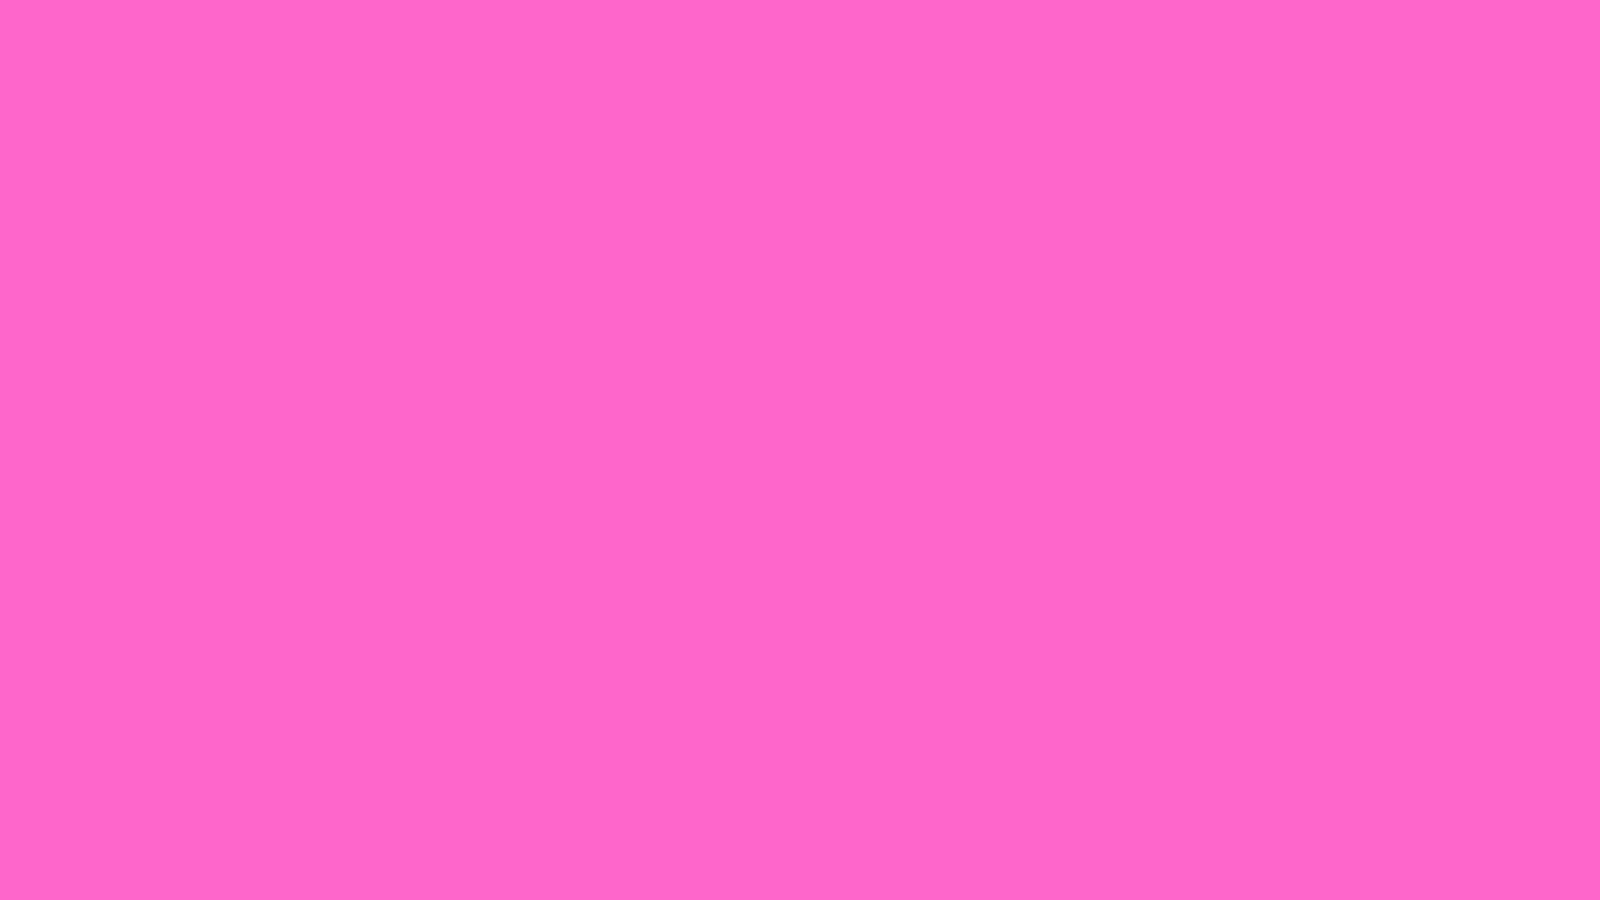 1600x900 Rose Pink Solid Color Background